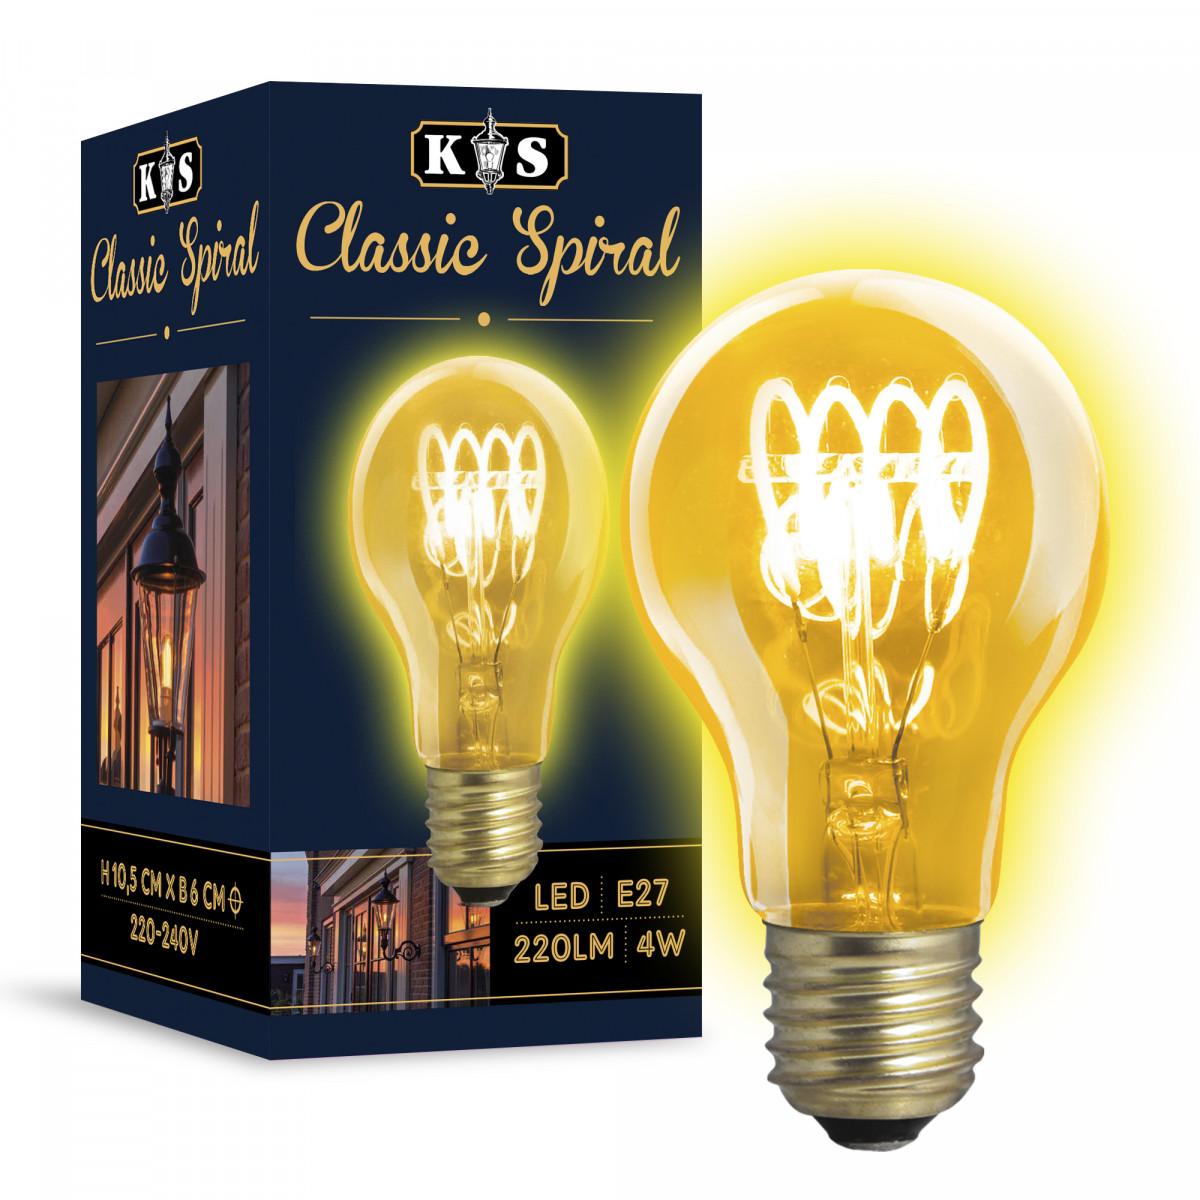 LED lamp Classic Spiral 4W